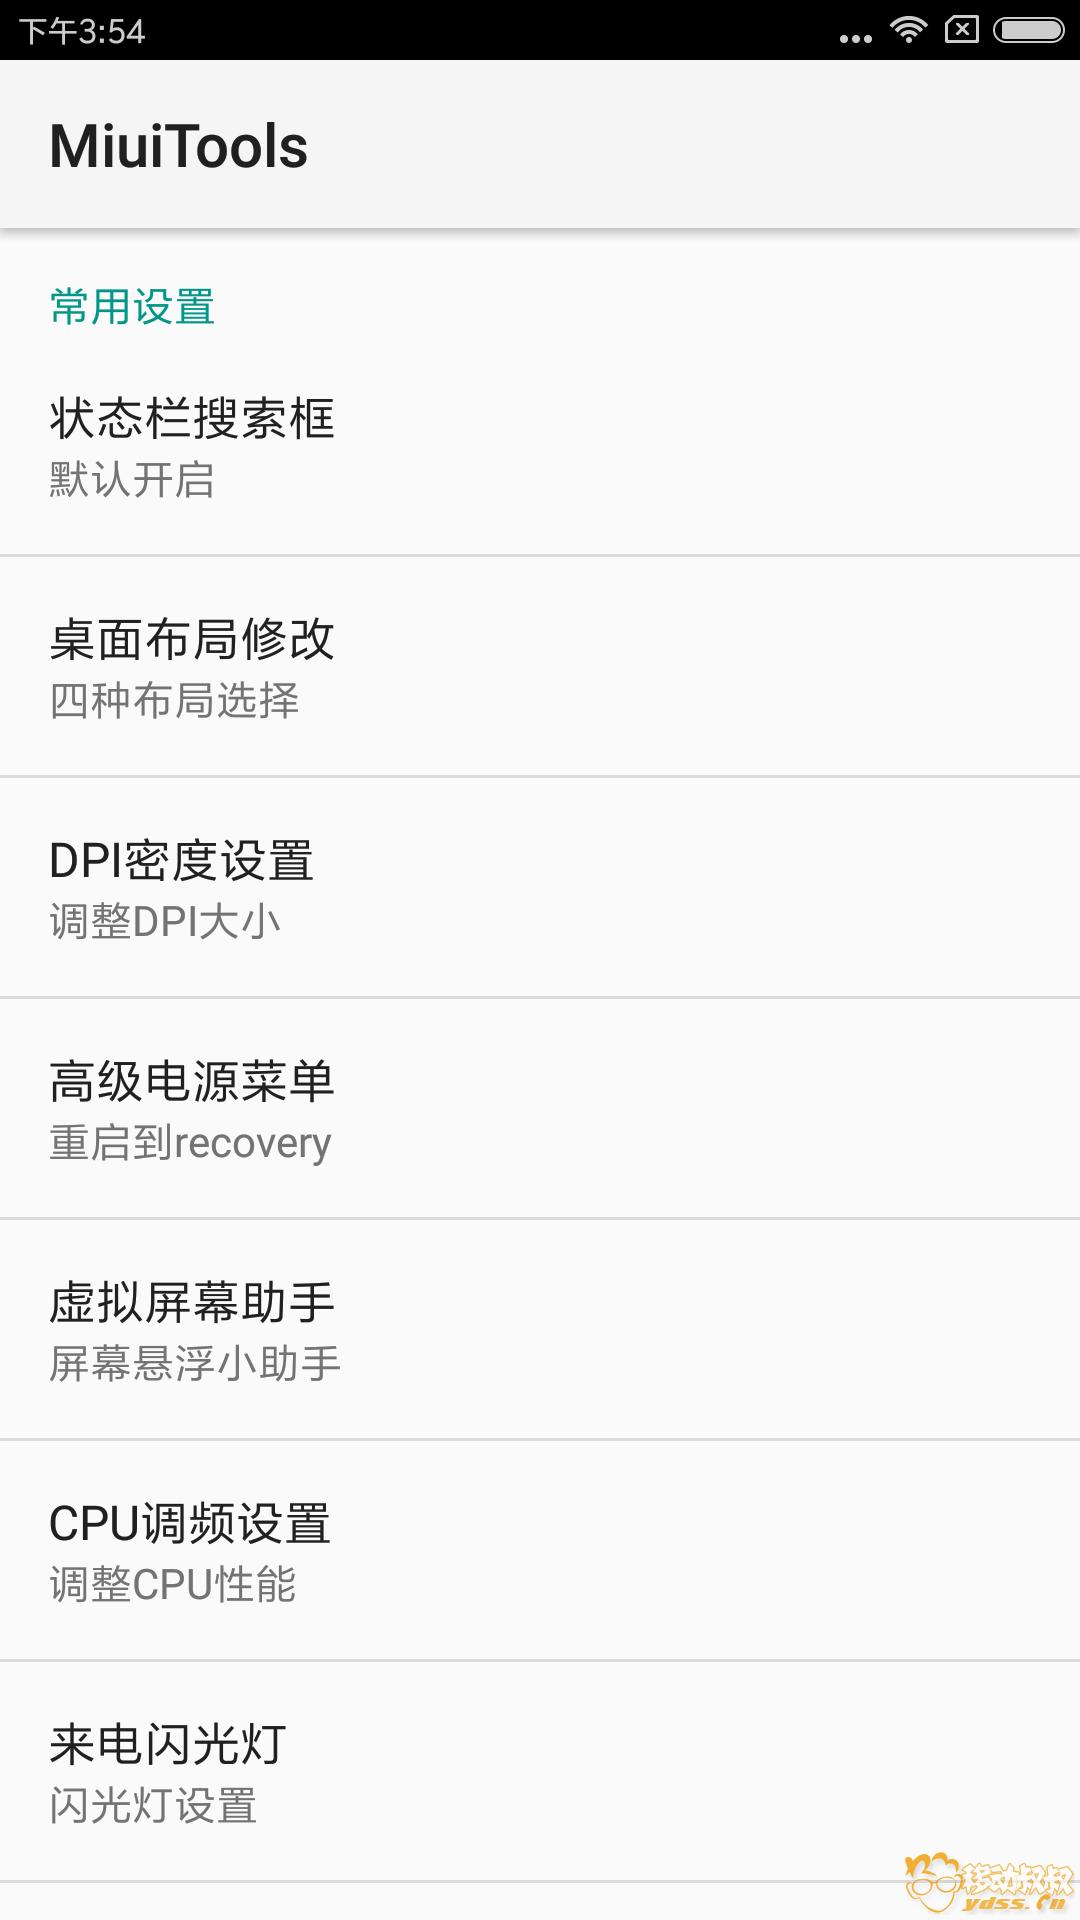 Screenshot_2017-10-21-15-54-40-777_com.anzhi.hwsettings.png